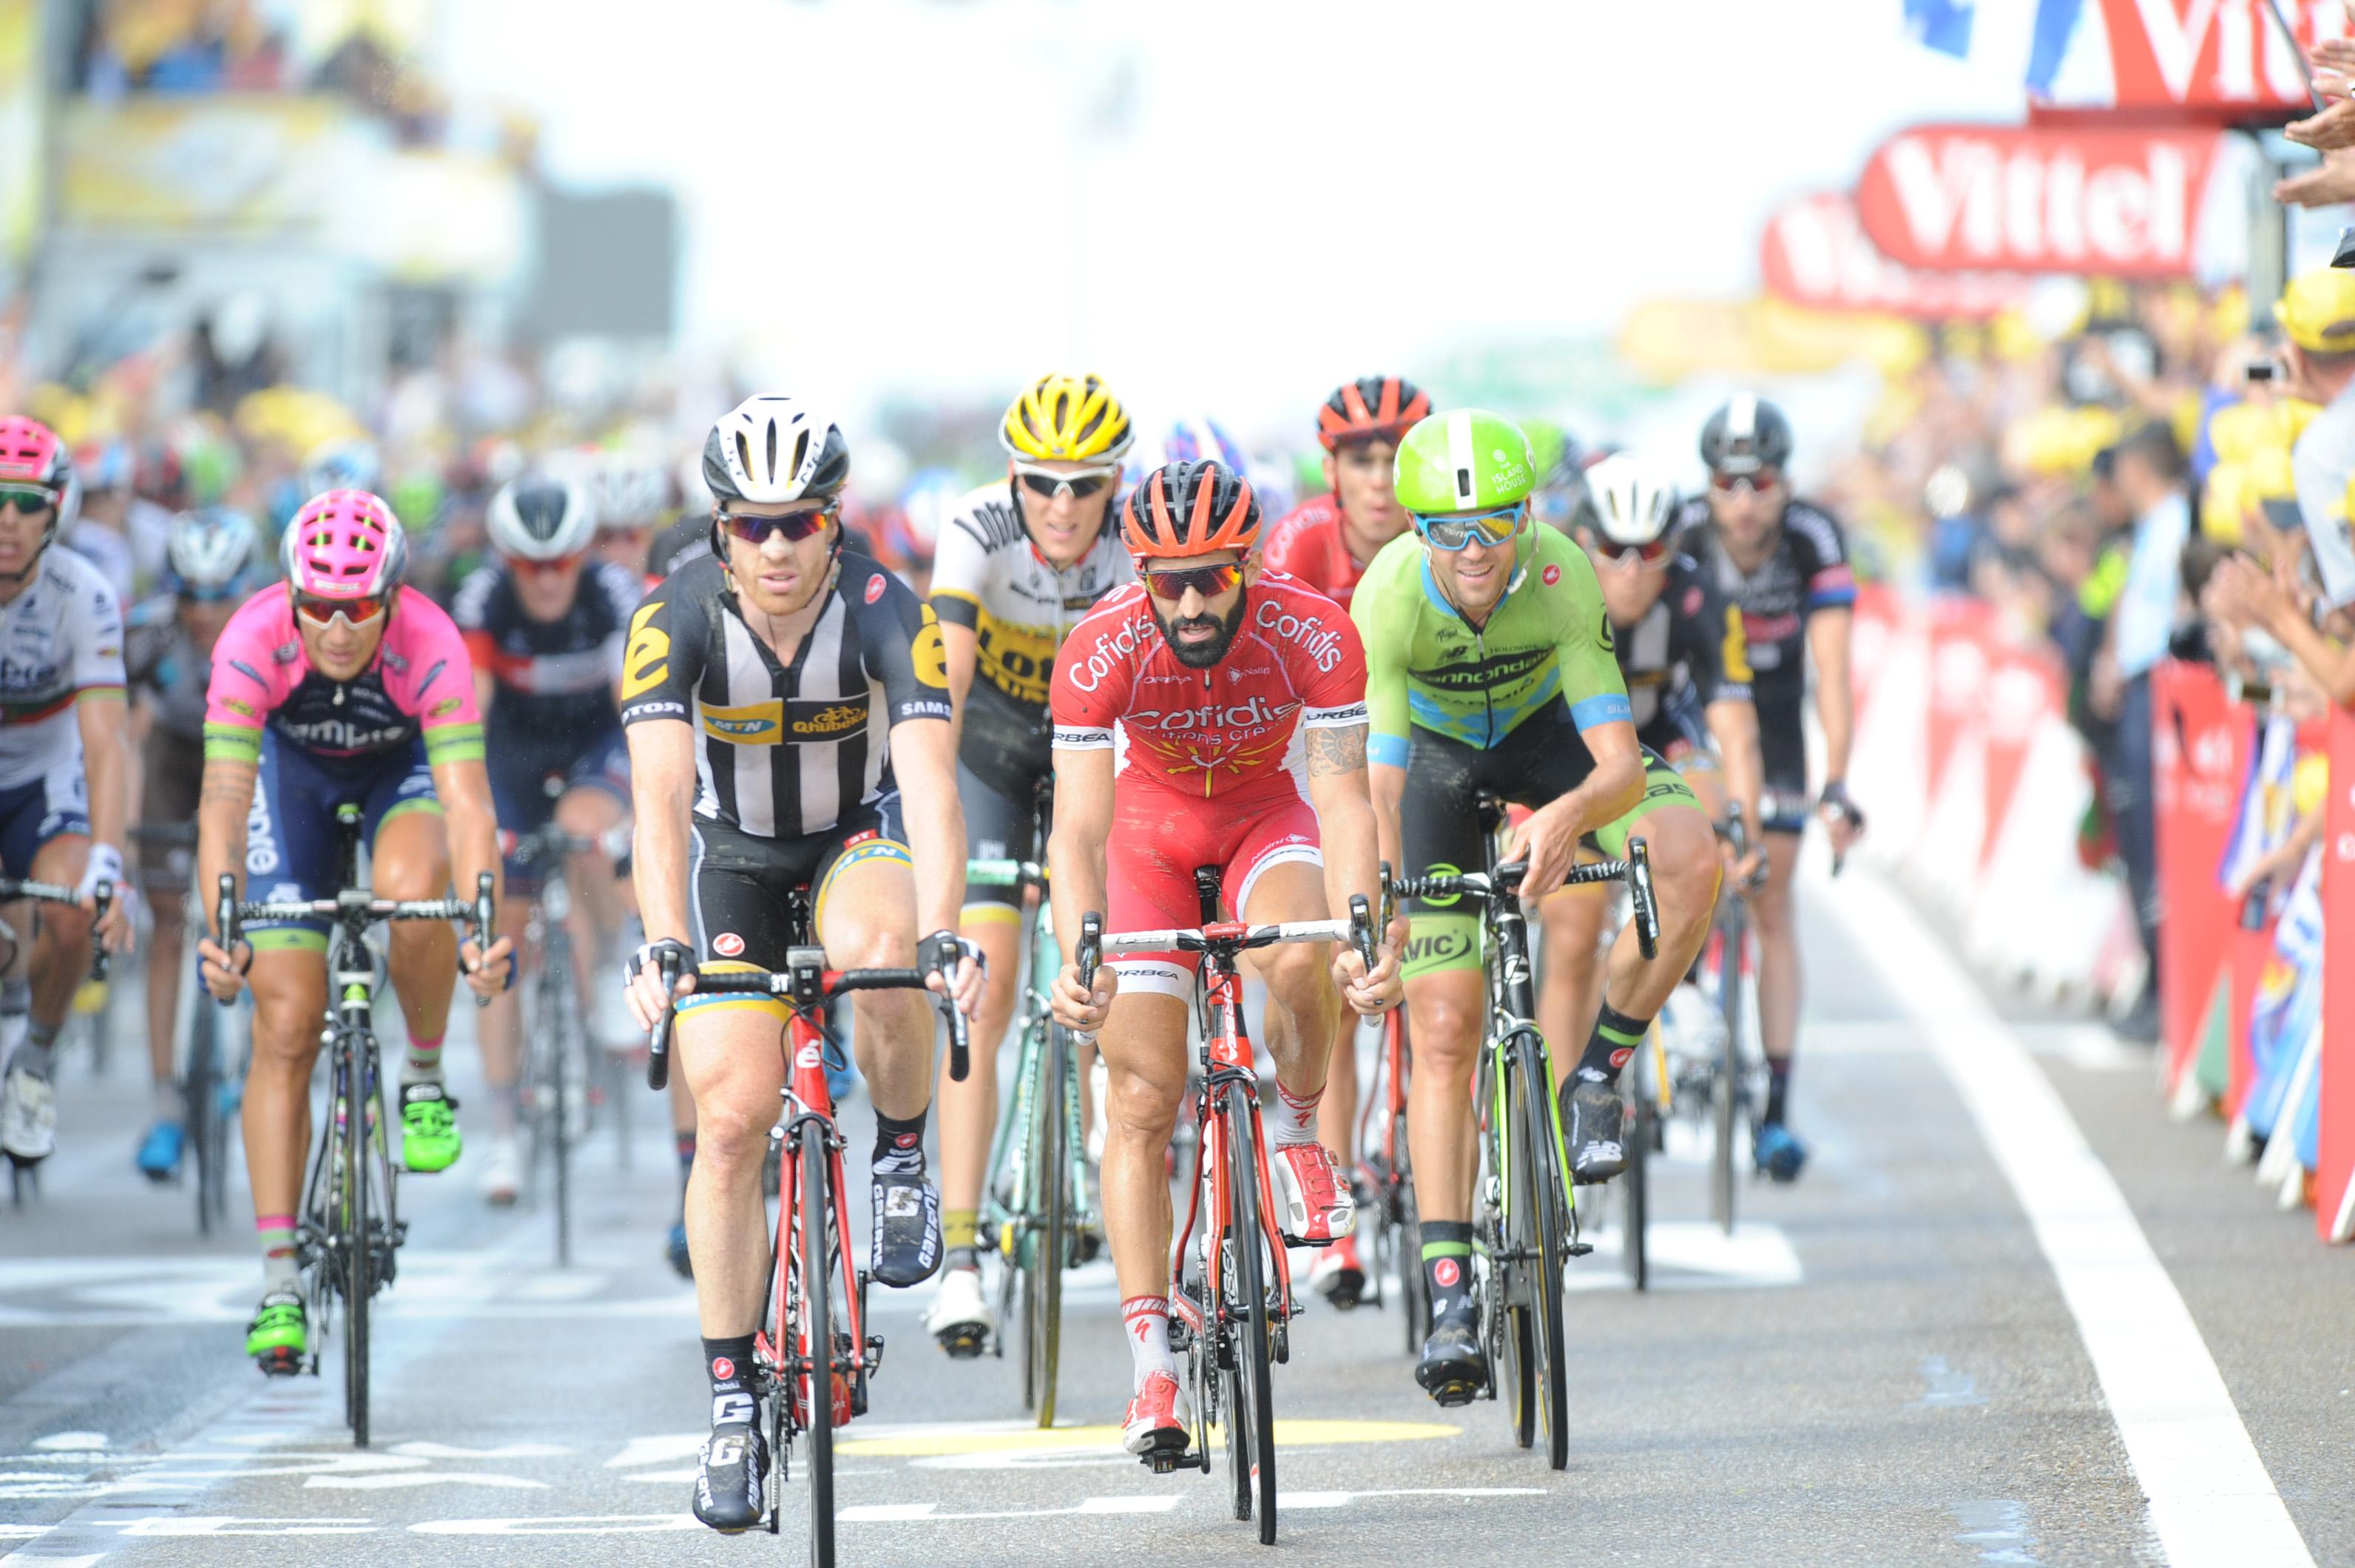 Eindrücke der 2. Etappe der Tour de France 2015.